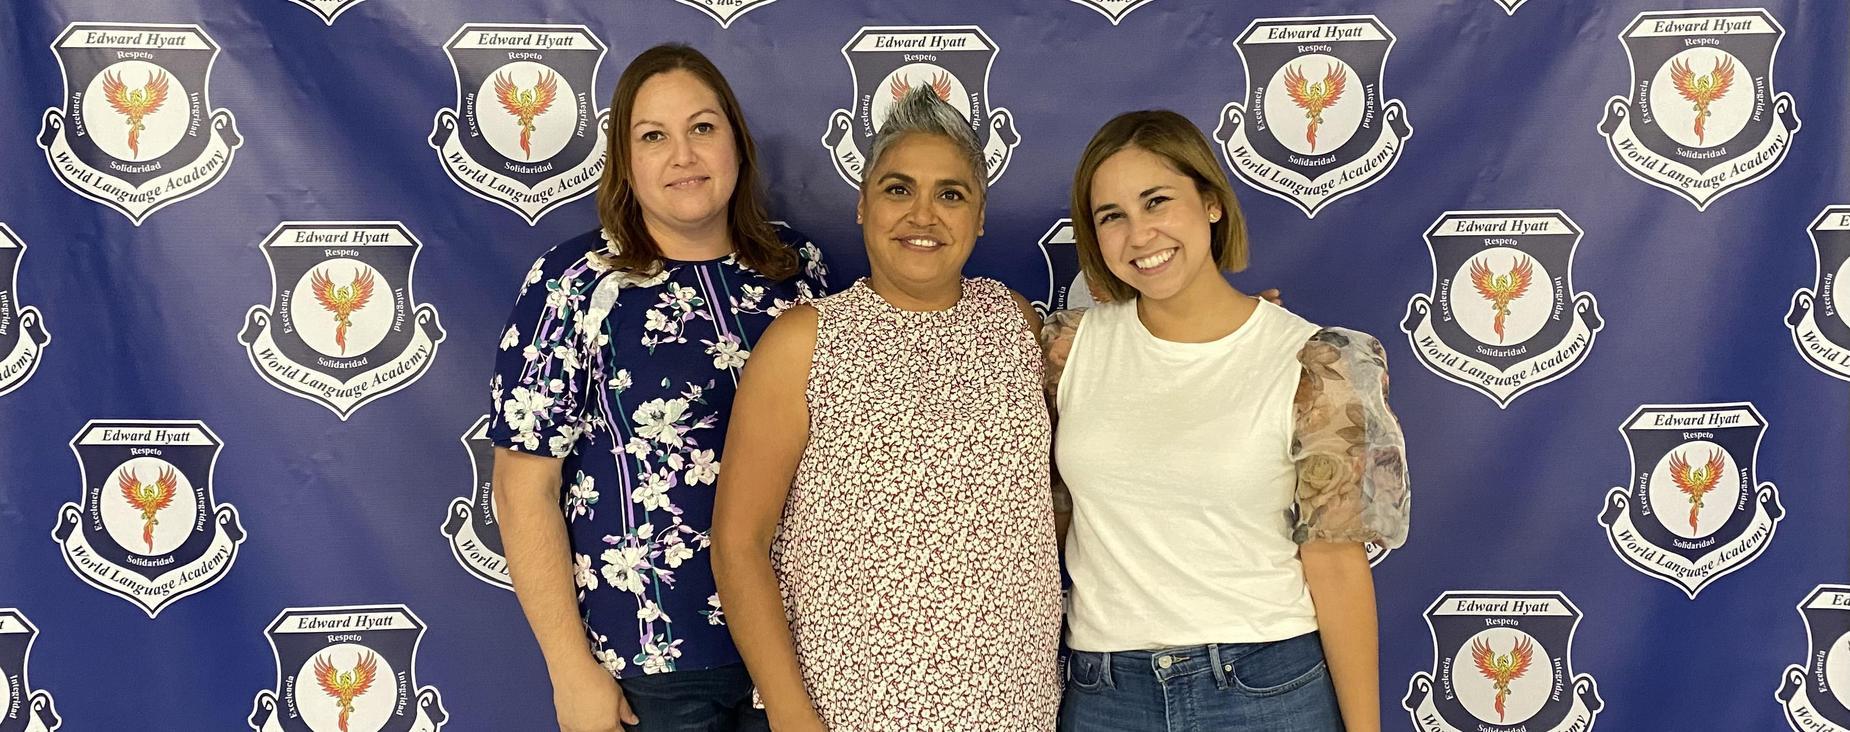 3 ladies standing